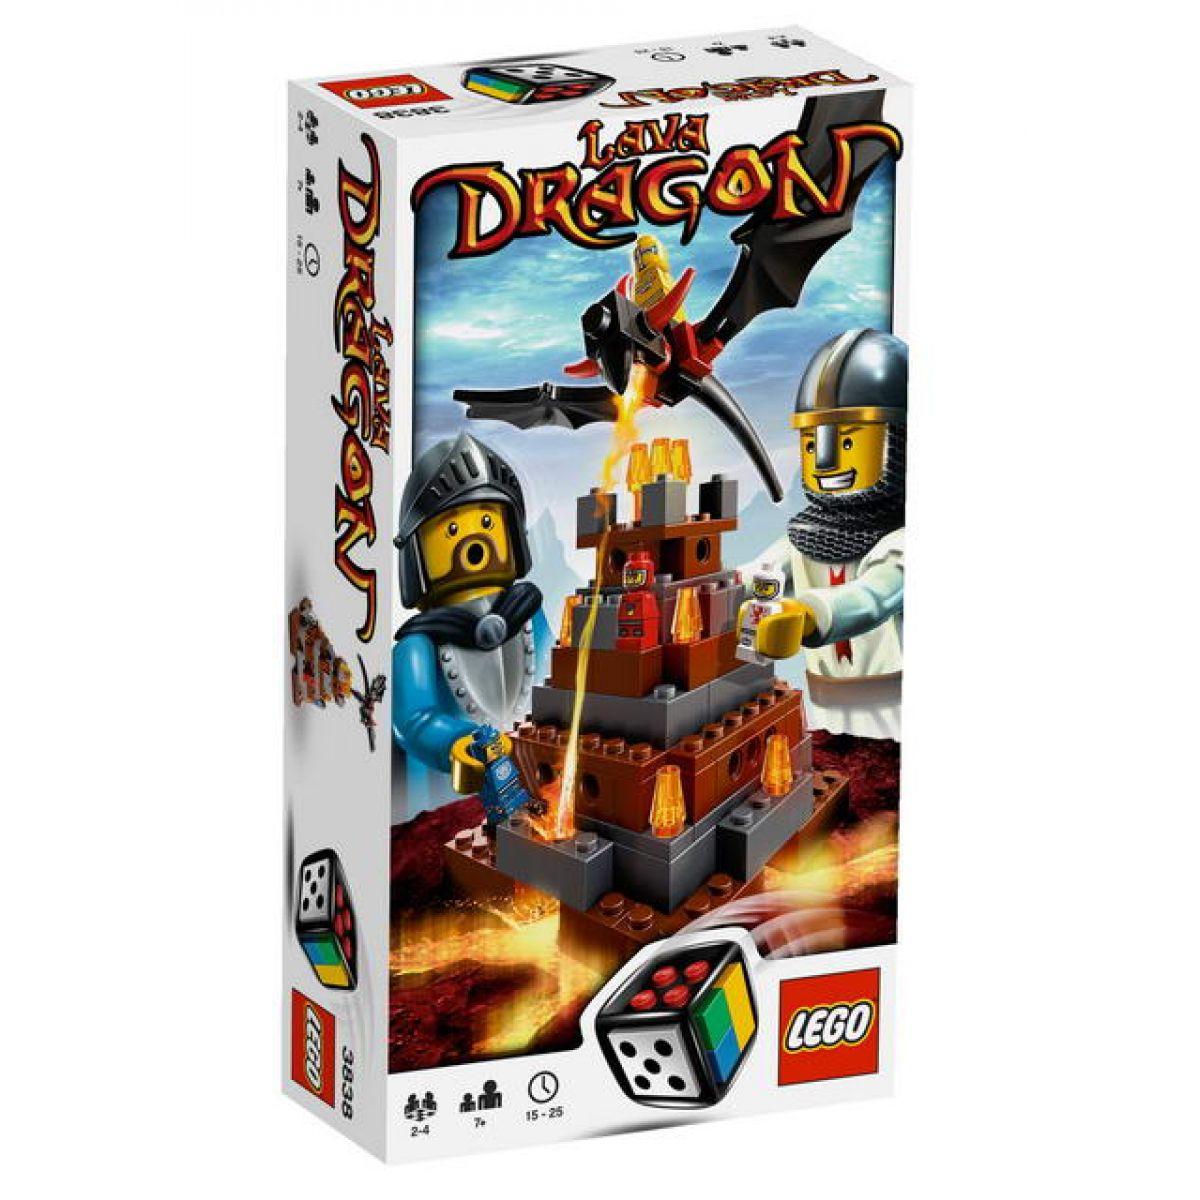 LEGO Games 3838 Lávový drak (LAVA DRAGON)